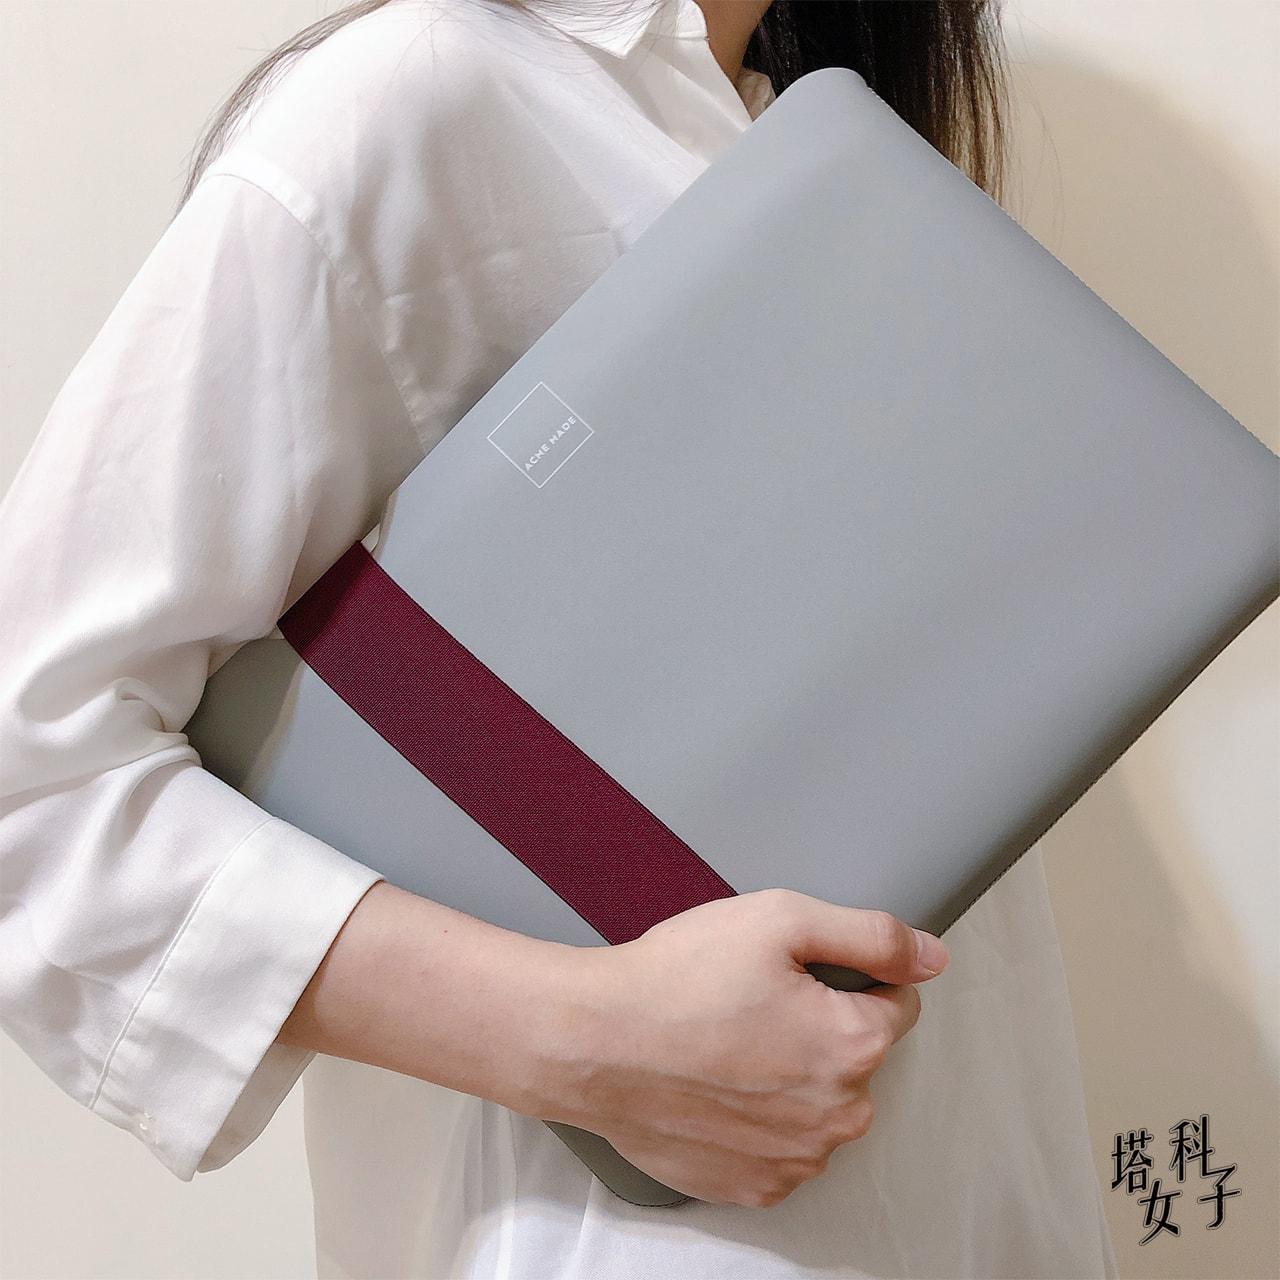 Macbook 保護套推薦Acme Made - Skinny Sleeve